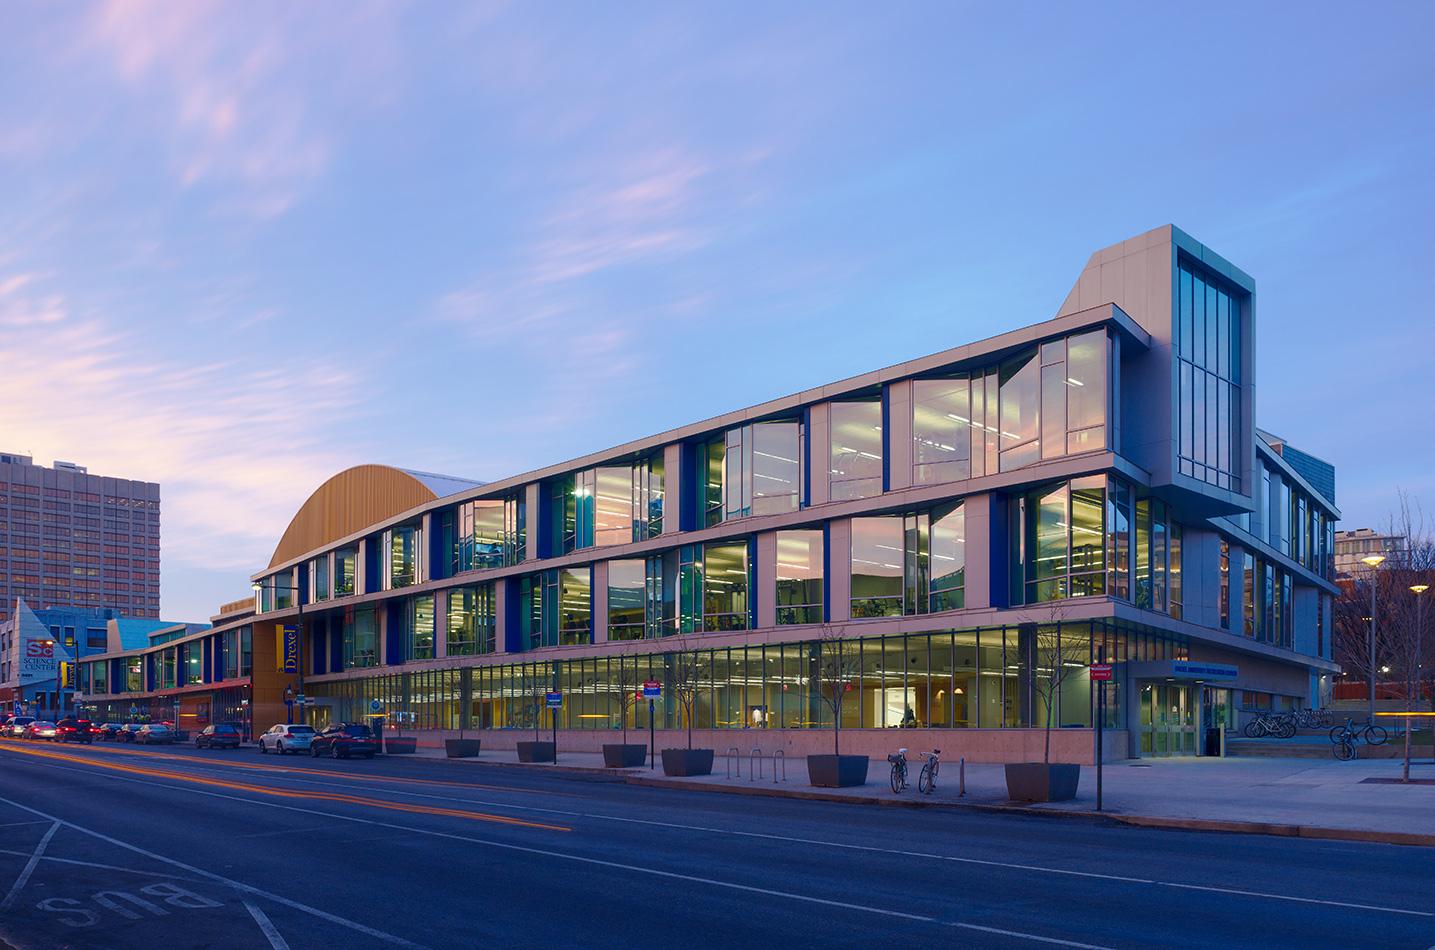 Drexel University Athletics  Philadelphia, PA  Architectural Photography by Architectural Photographer Joseph M Kitchen